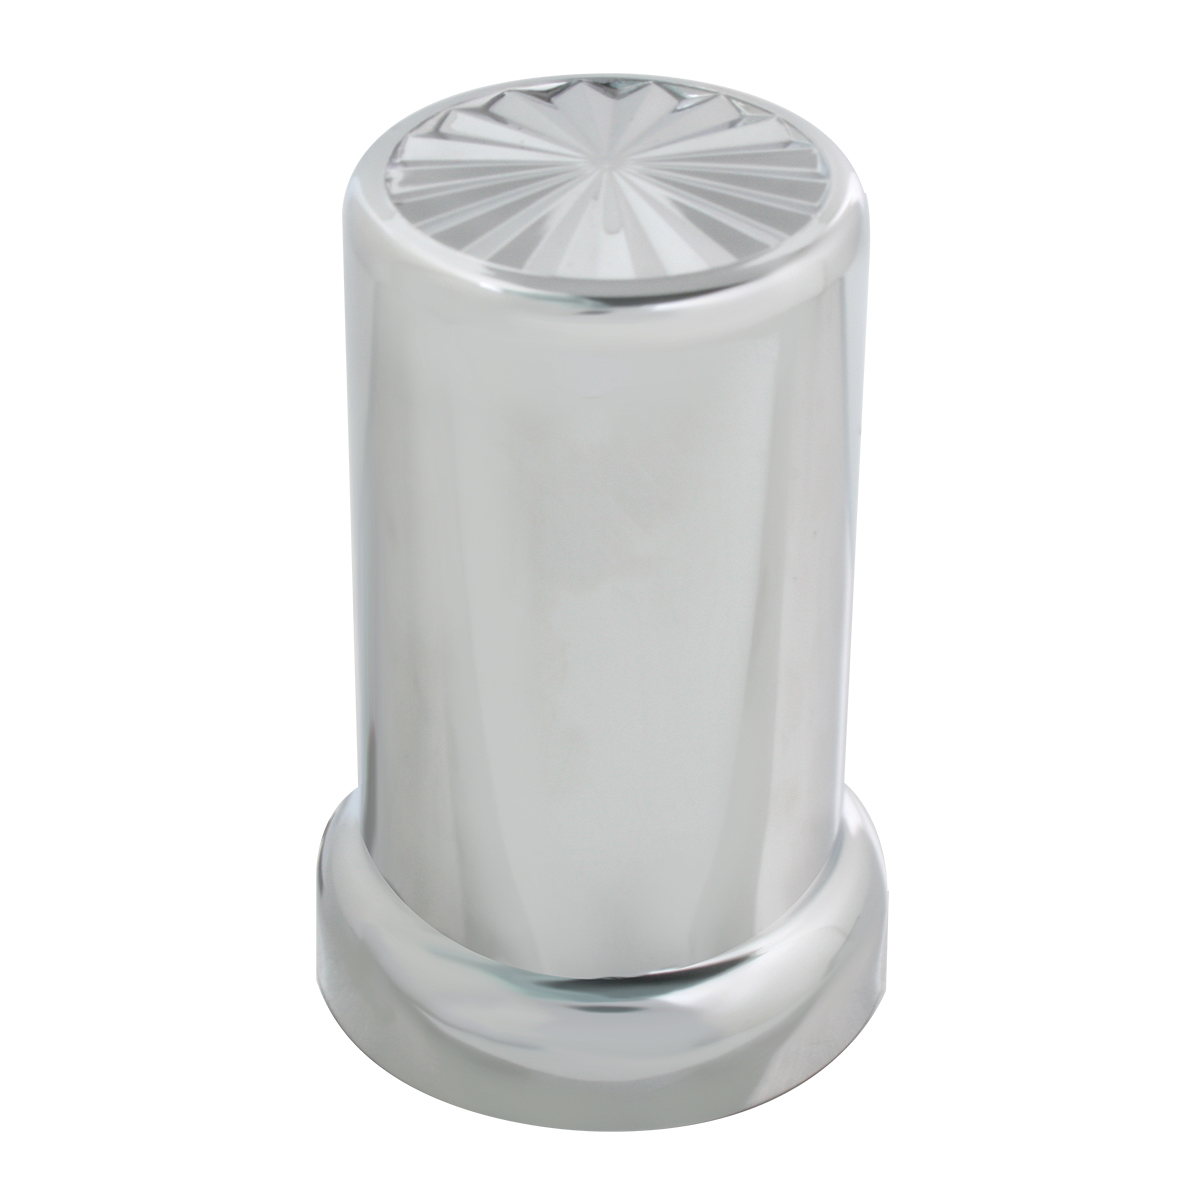 Pin Wheel Chrome Plastic Lug Nut Cover